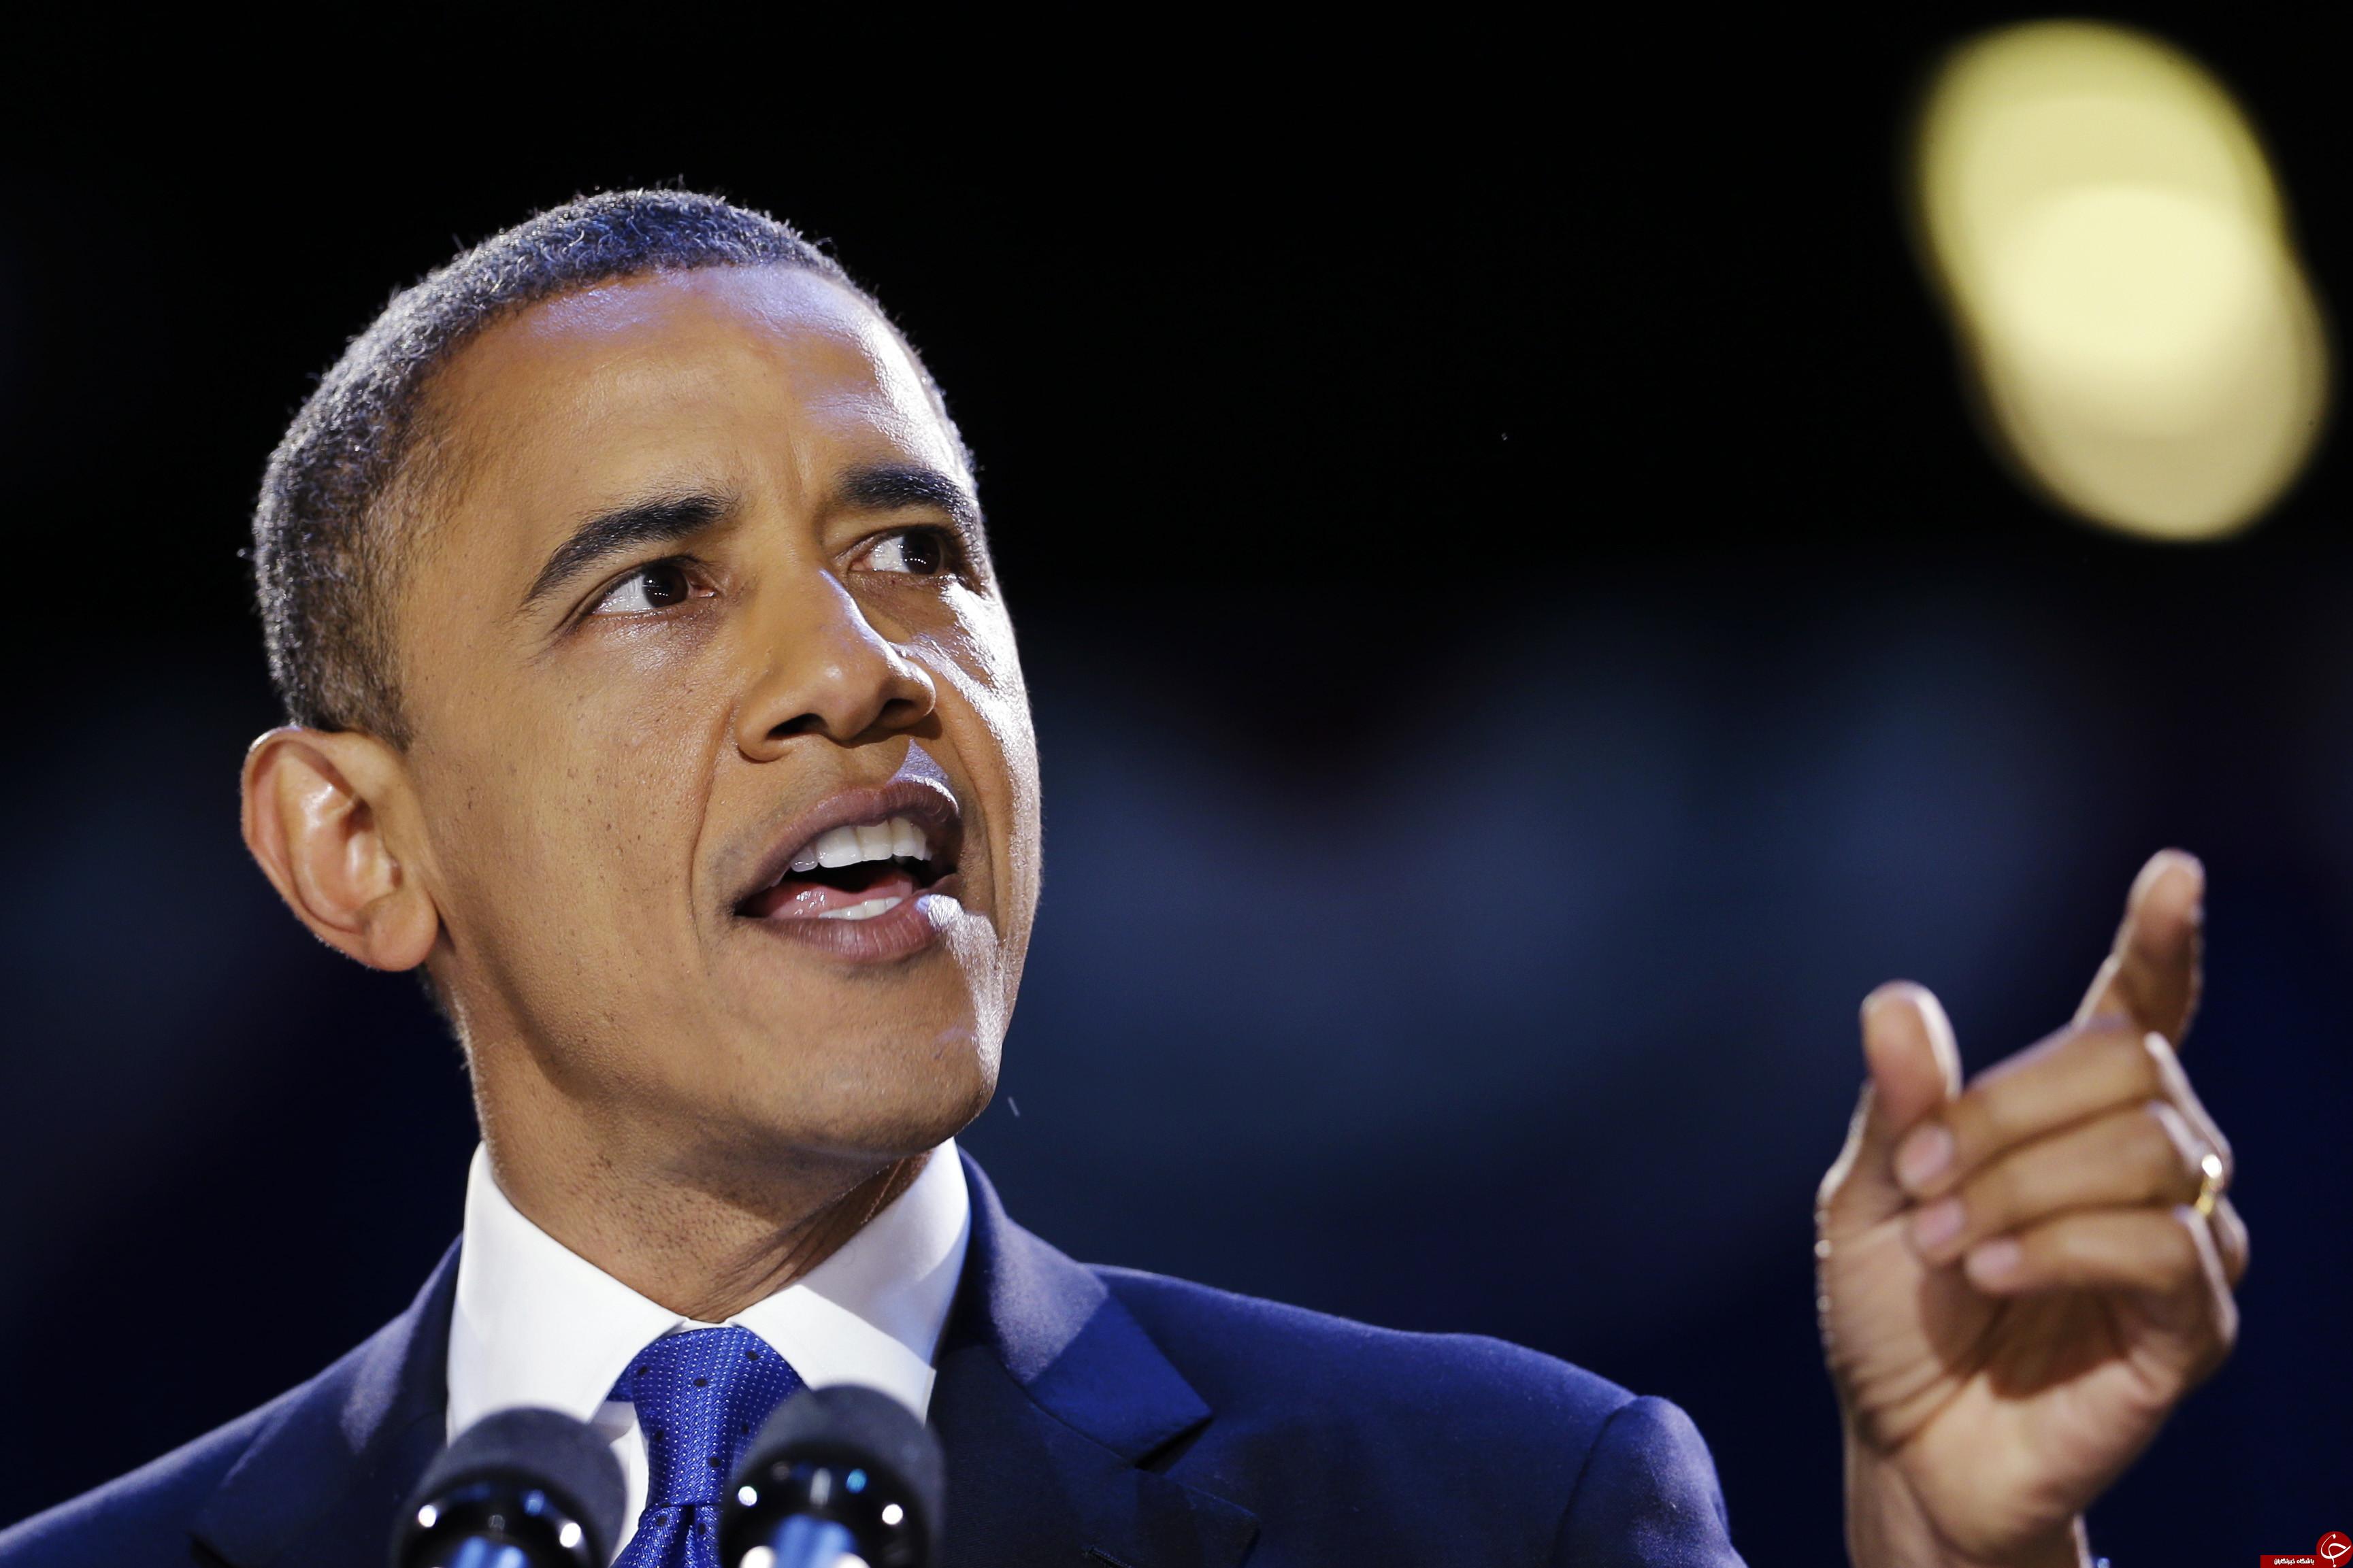 آیا اوباما تکرار میشود؟